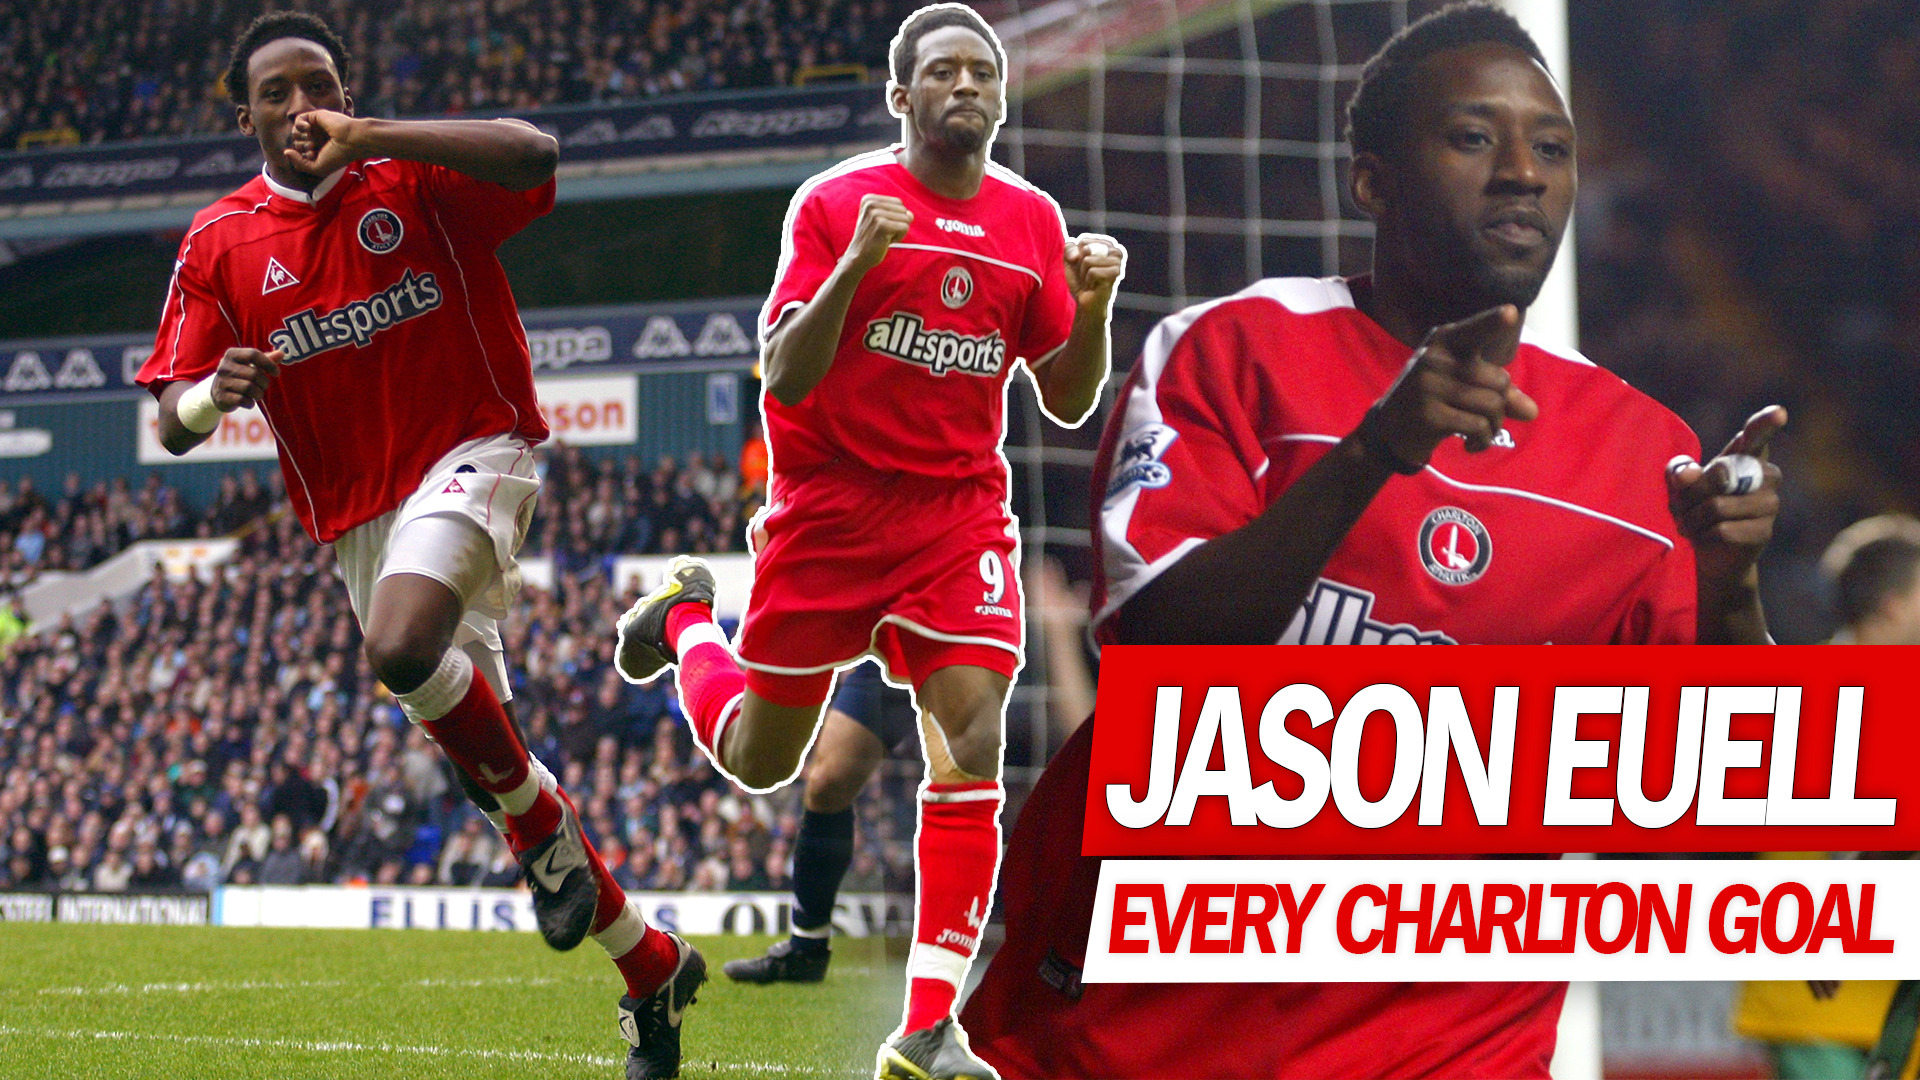 EVERY CHARLTON GOAL | Jason Euell